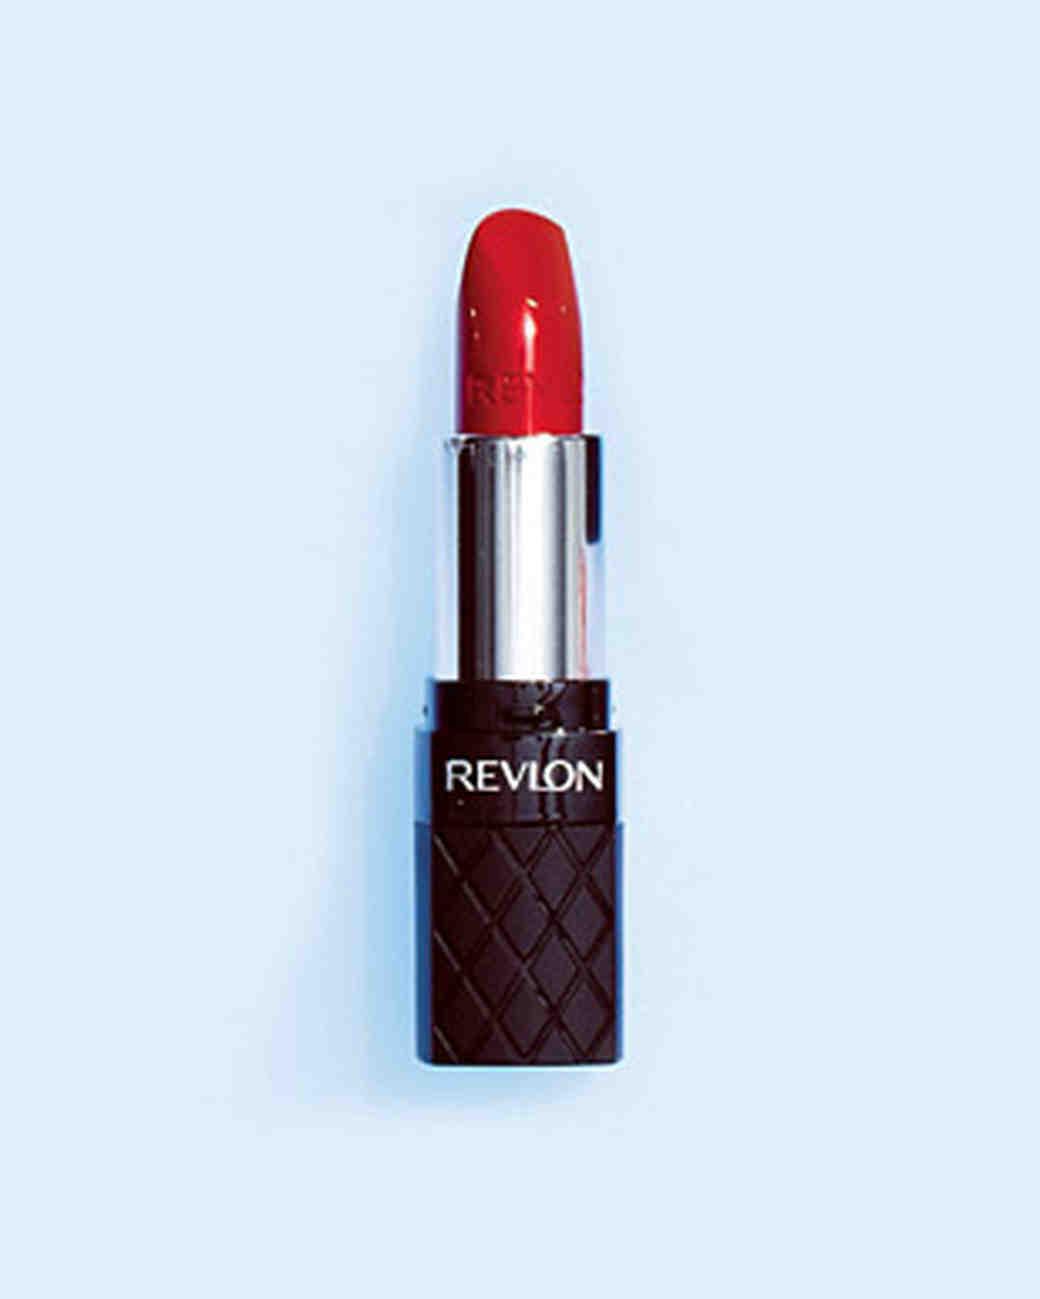 lipstick-cosmetic-mwd107916.jpg